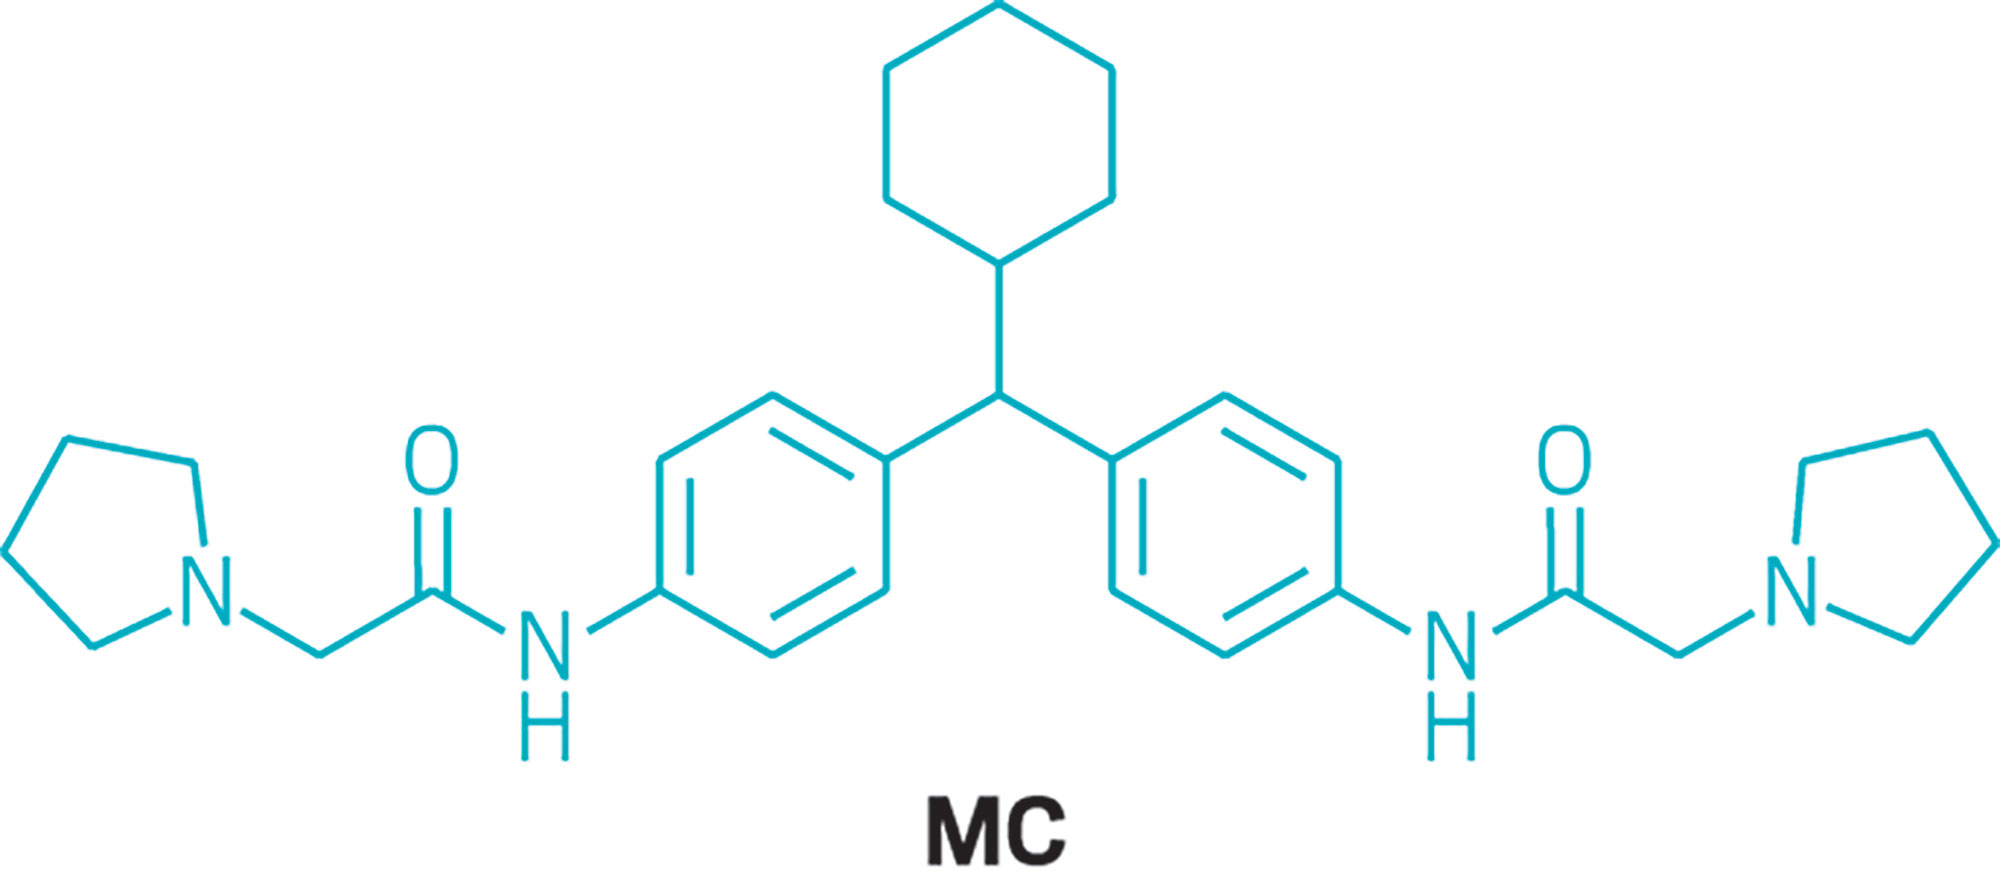 Molecular chaperone slows prion disease